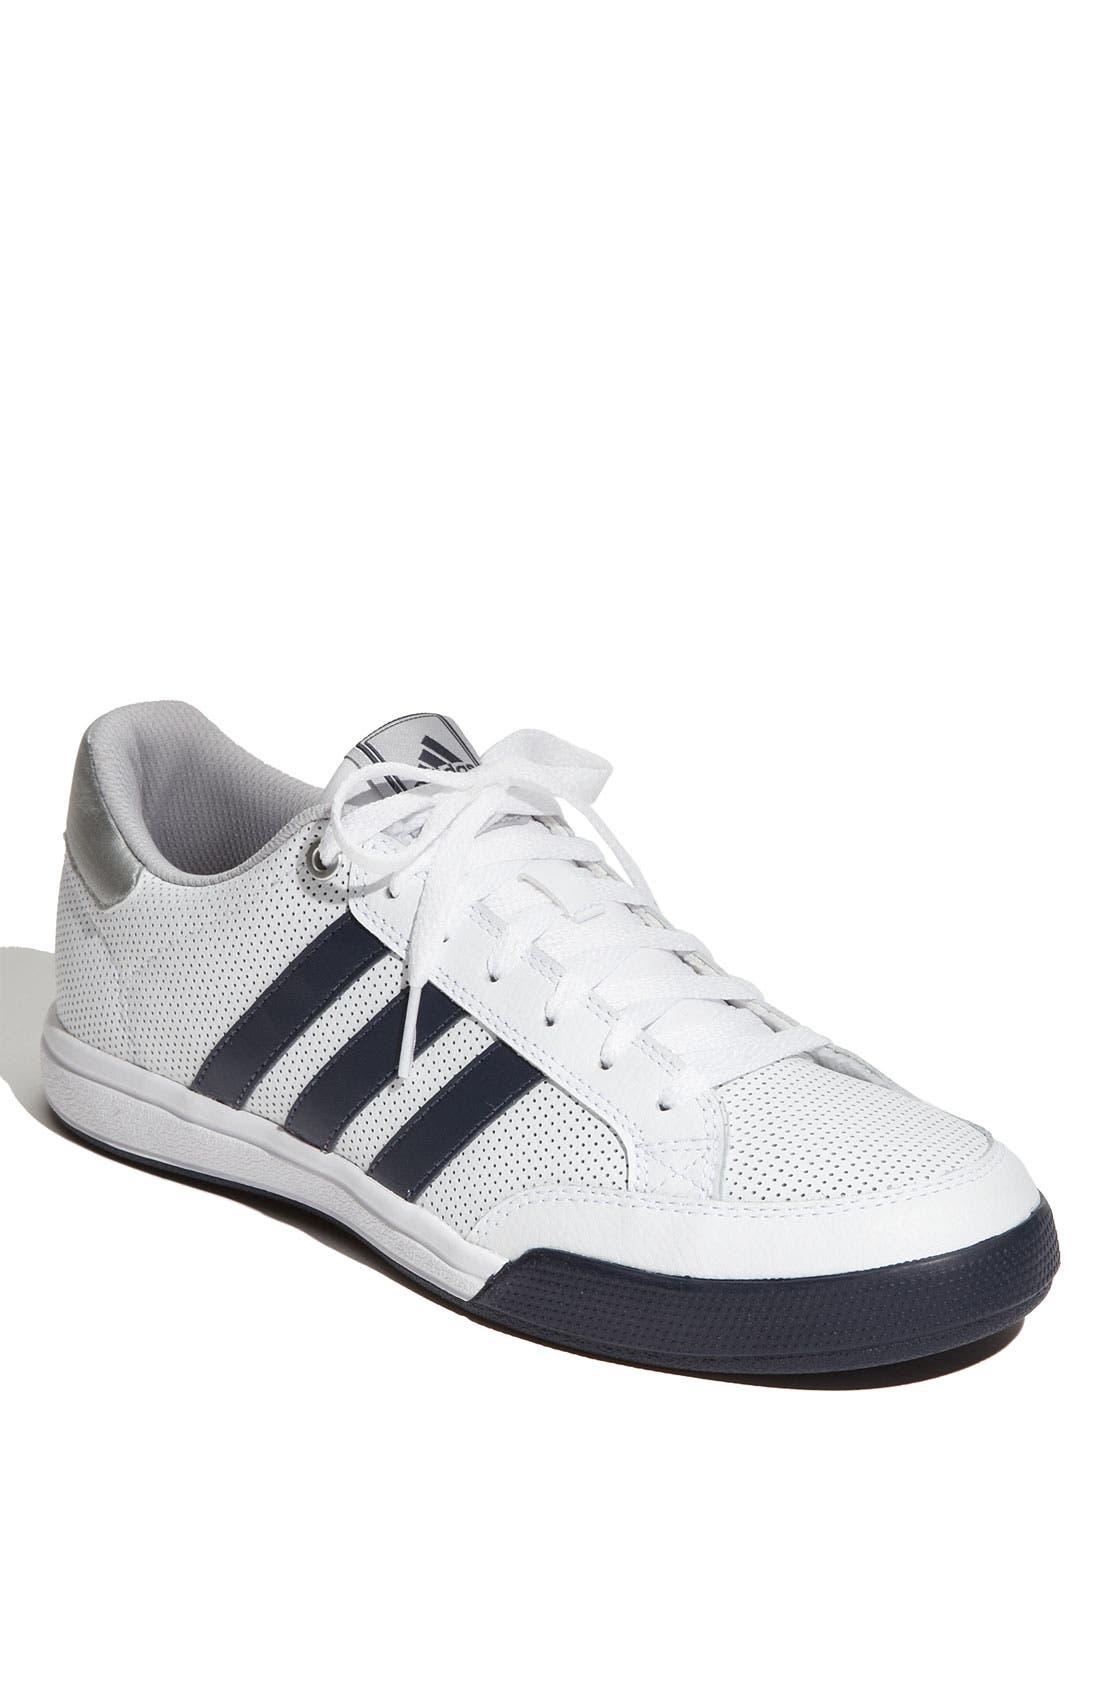 Alternate Image 1 Selected - adidas 'Oracle Stripes IV' Sneaker (Men)